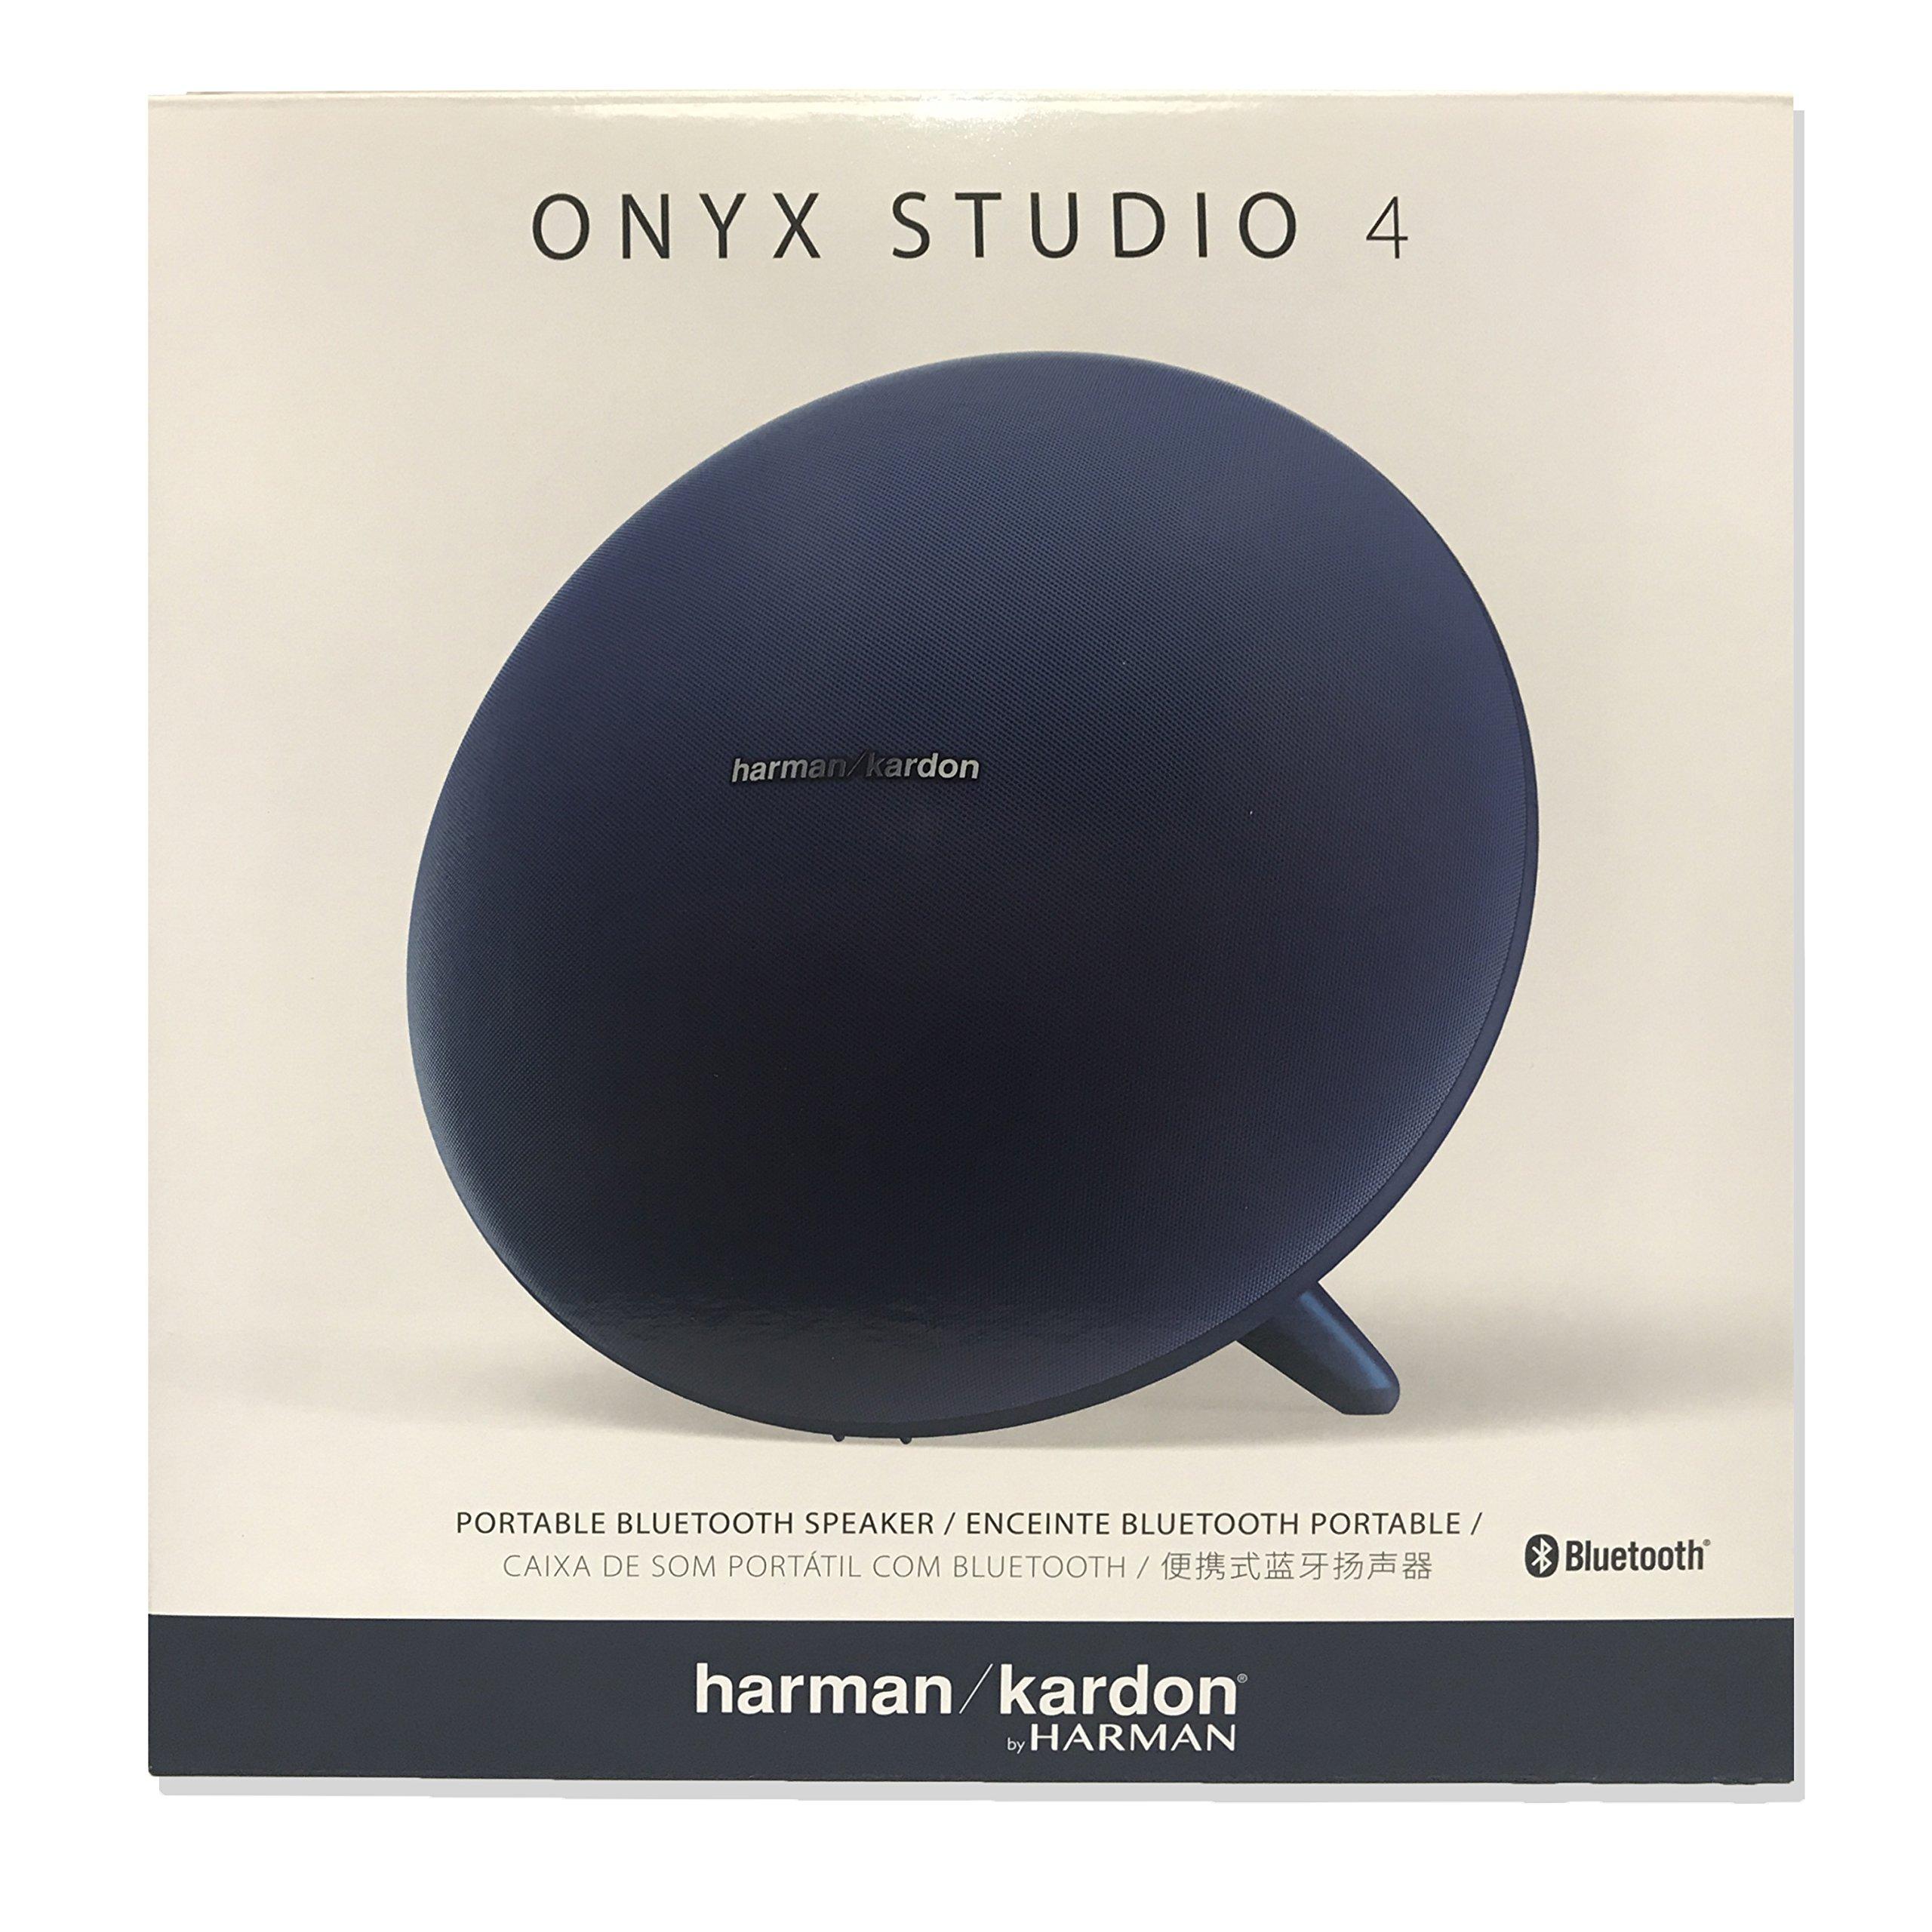 Harman Kardon Onyx Studio 4 Wireless Bluetooth Speaker Blue (New model) by Harman Kardon (Image #1)